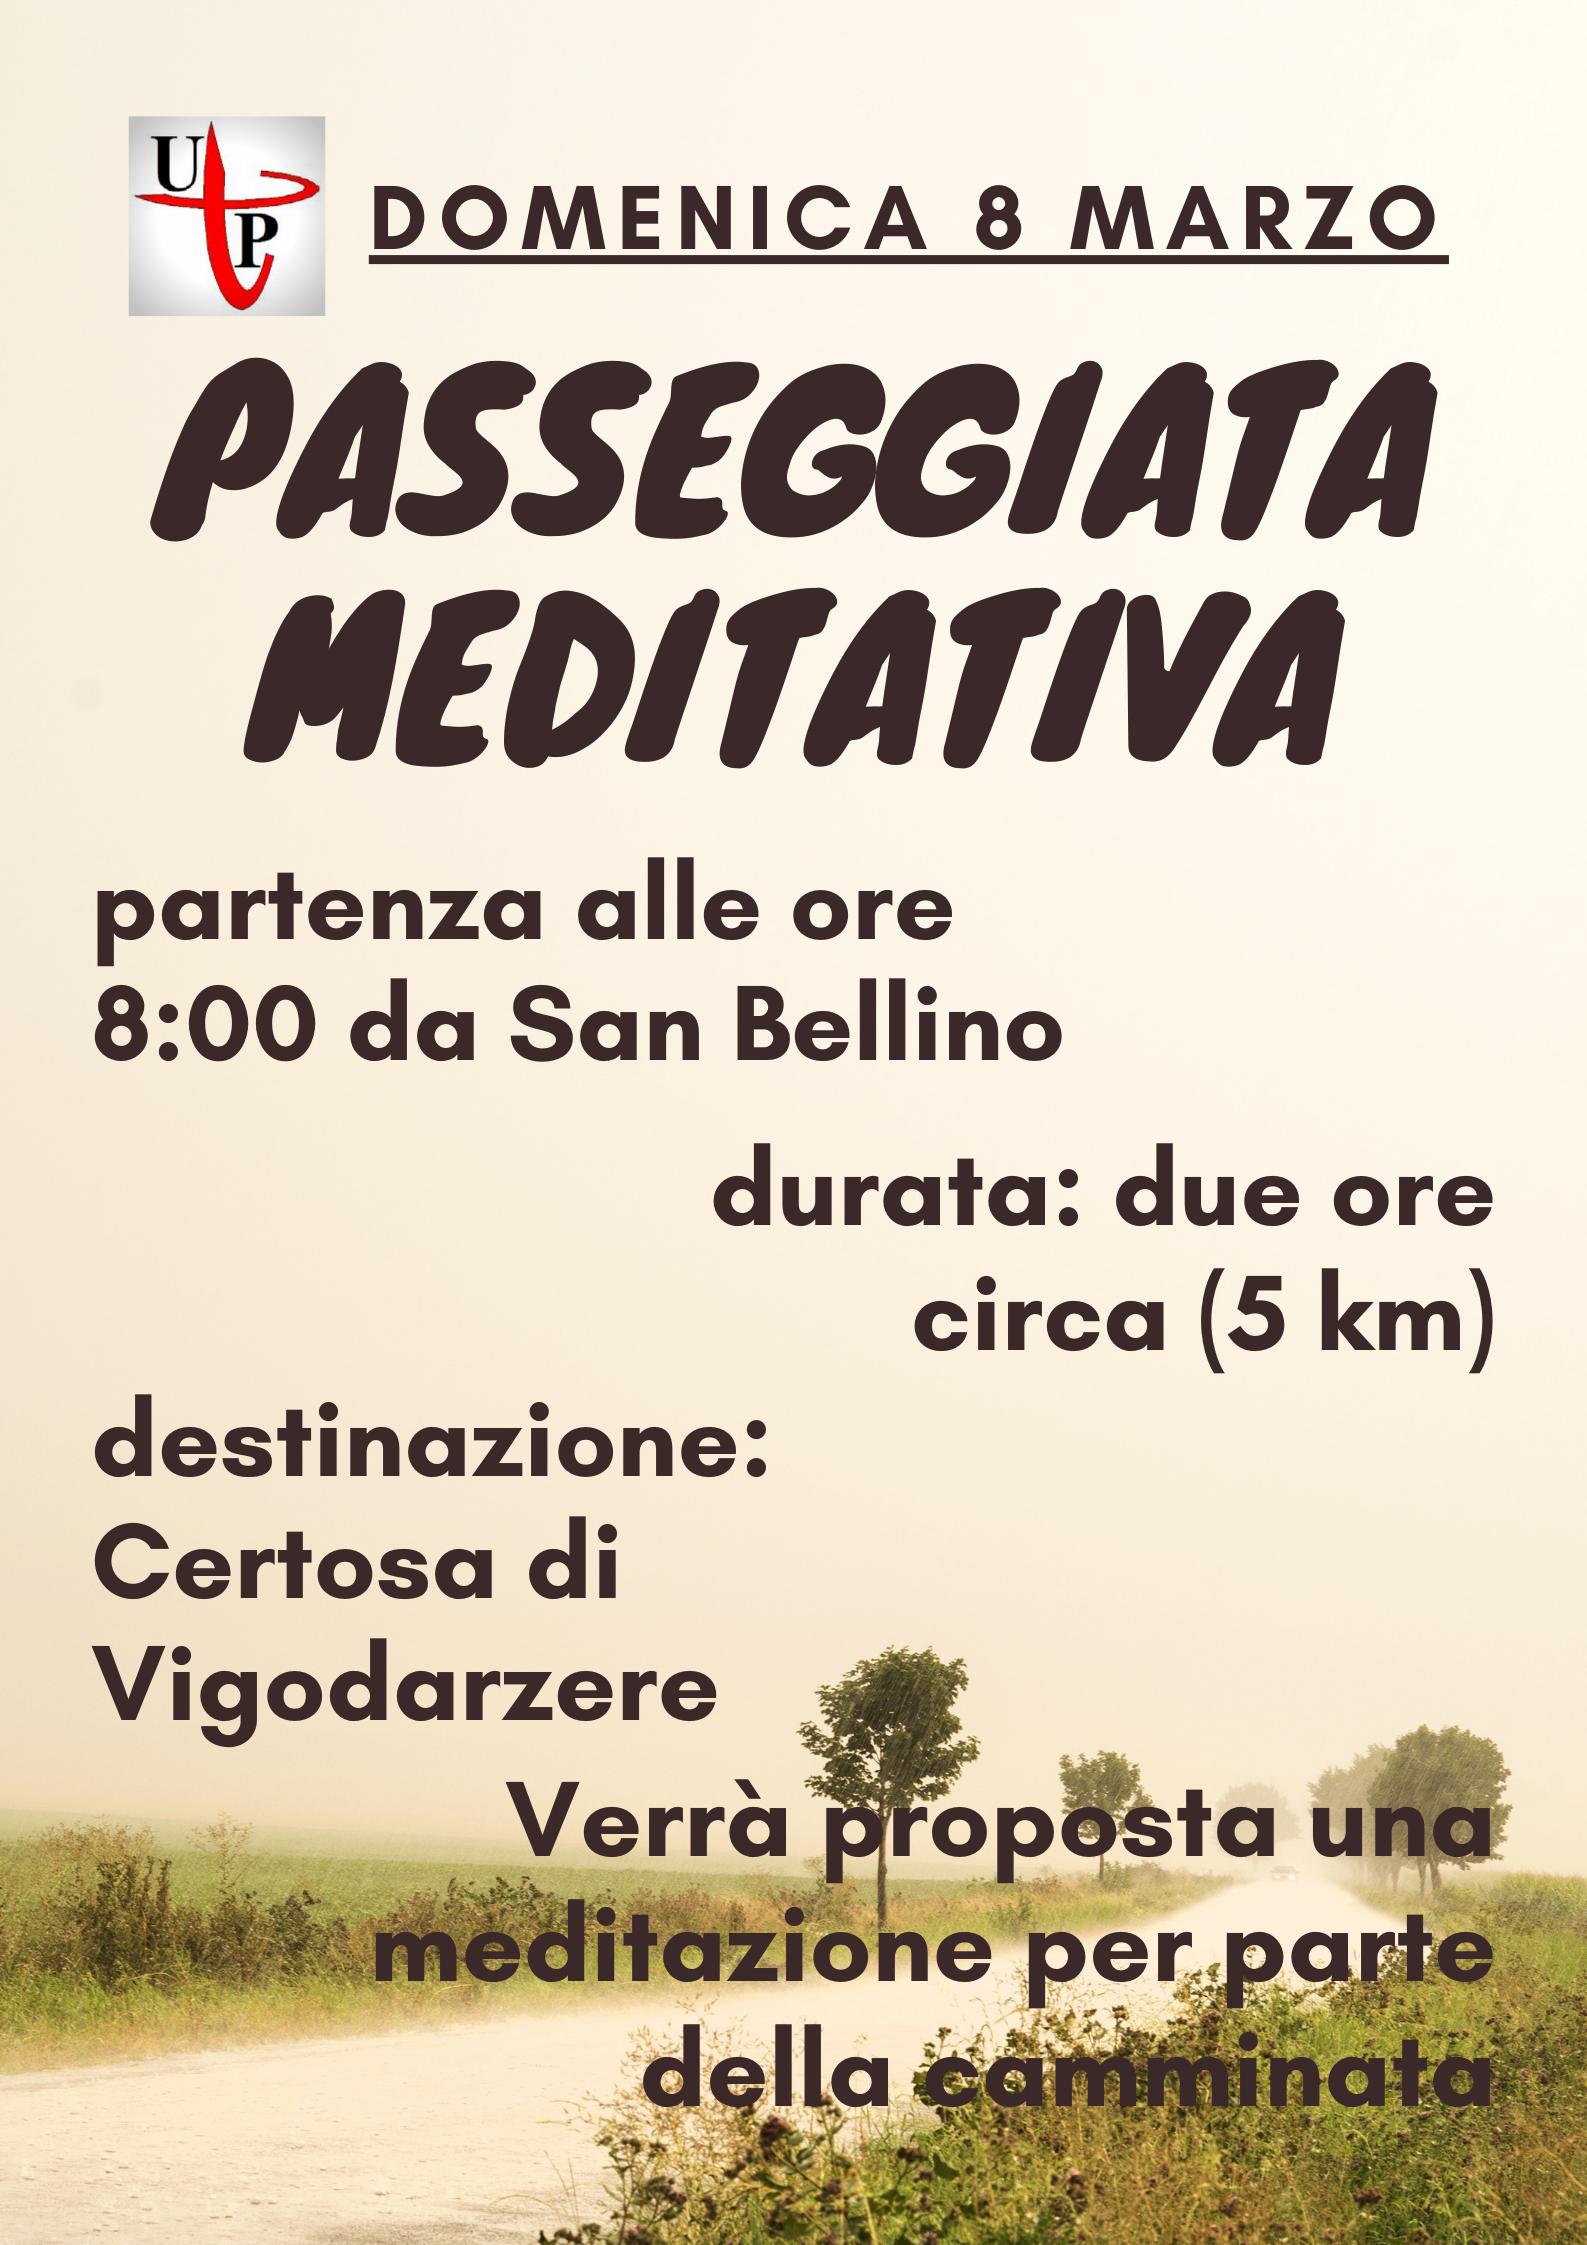 passeggiata meditativa